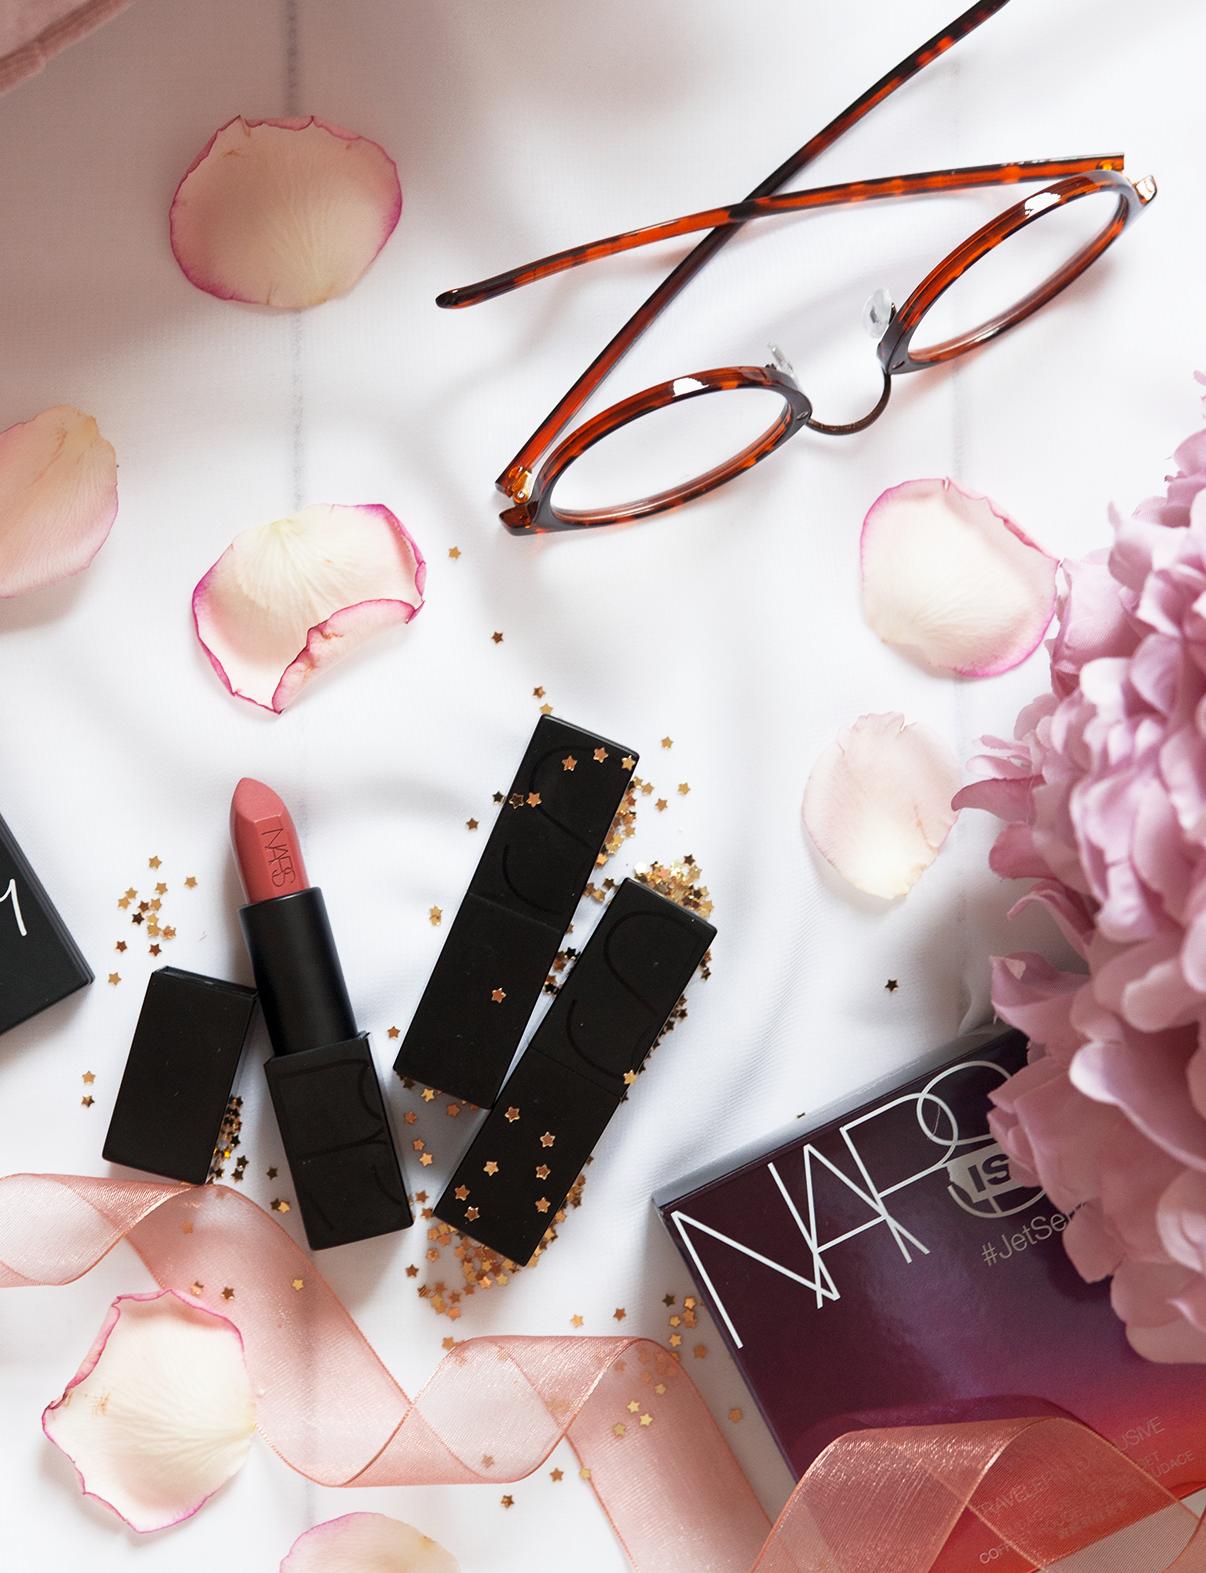 nars jetsetter audacious lipstick trio set